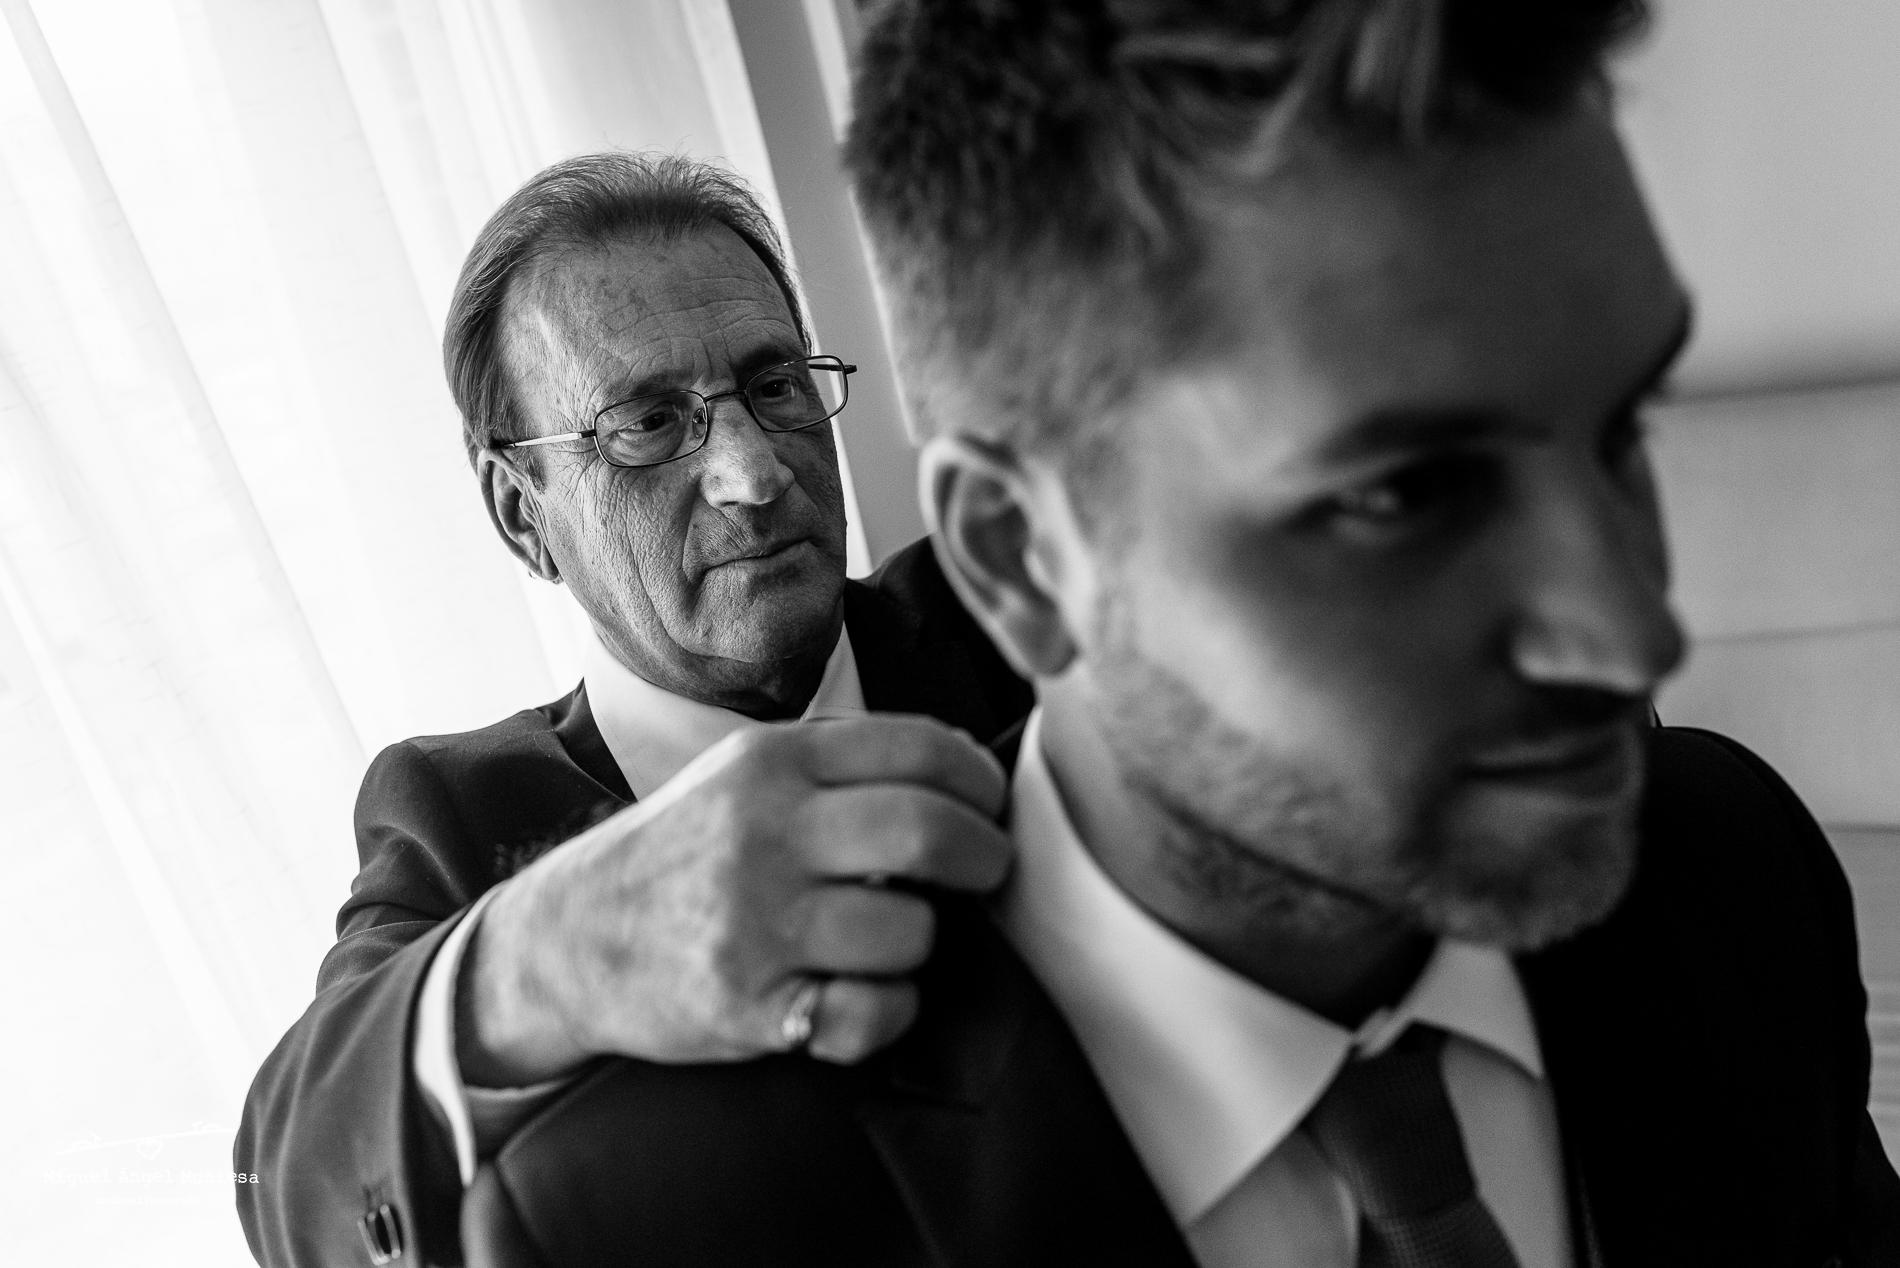 miguel angel muniesa, fotografo boda Teruel, fotografo boda navarra, fotografo boda zaragoza, fotografo boda soria, miguel angel muniesa emotional photography_08